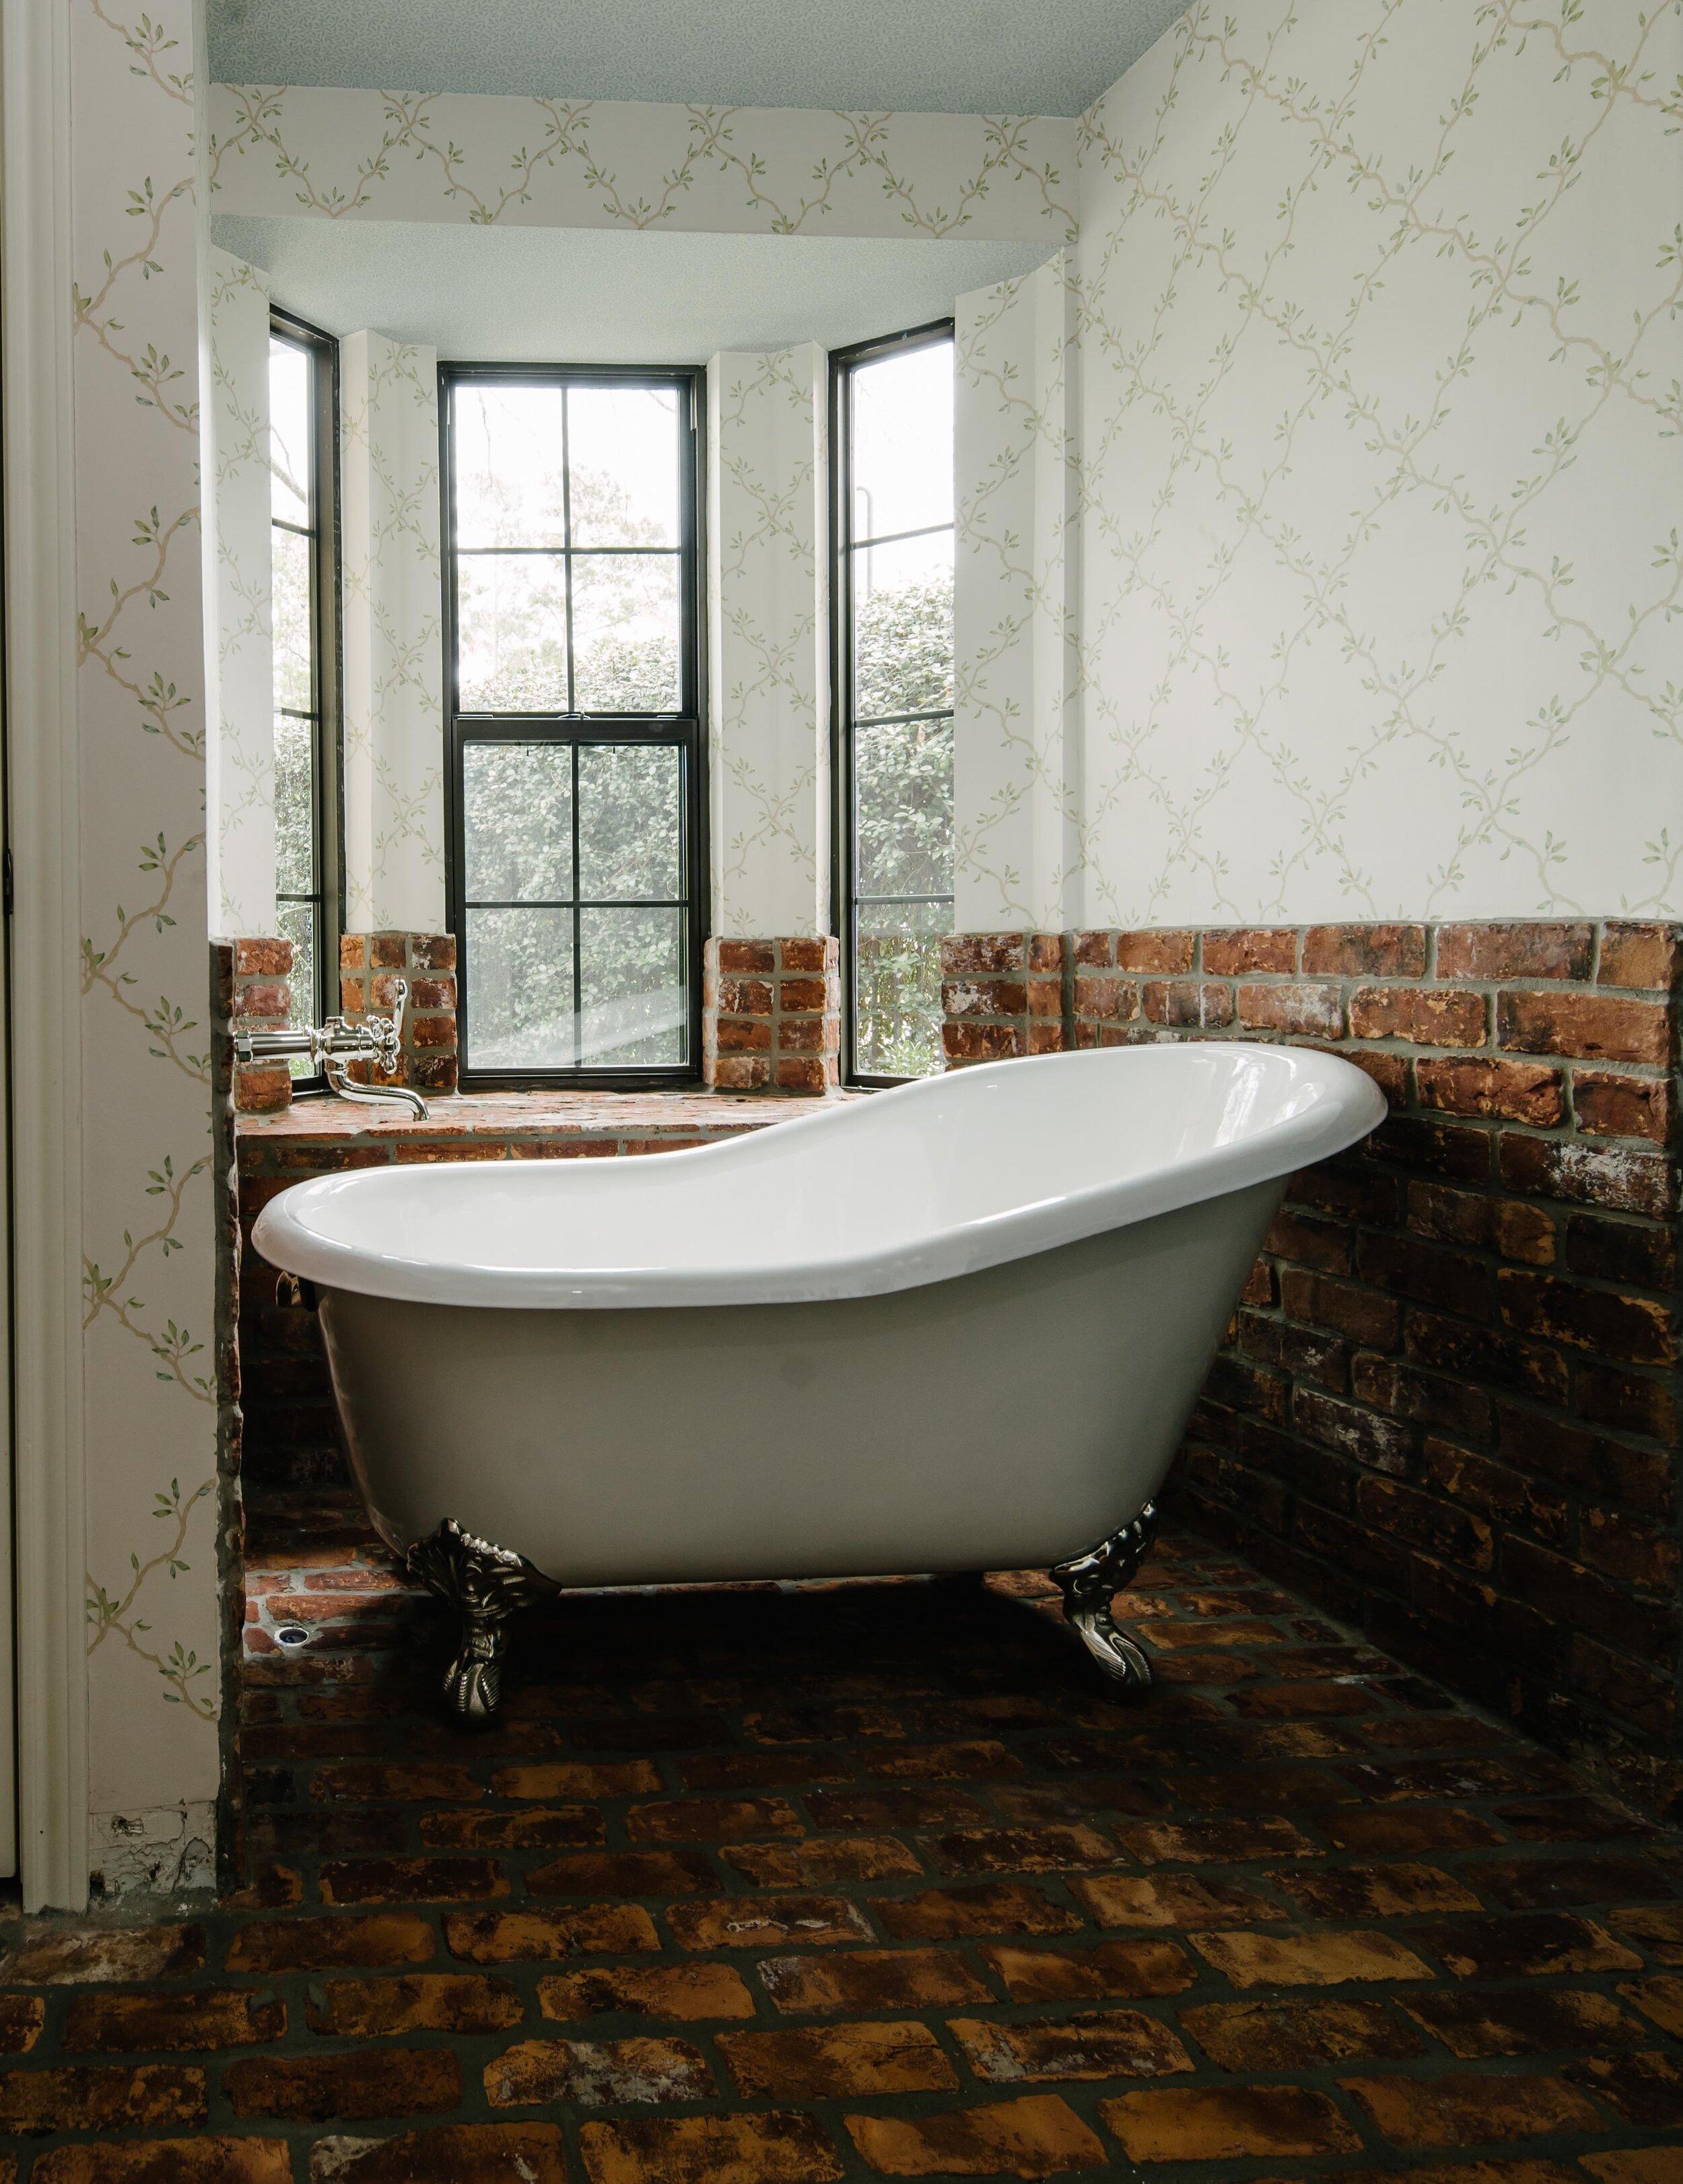 Claw foot bathtub, free standing bathtub, rustic brick floor, intricate wall papering, master bathroom renovation, master bathroom remodel.